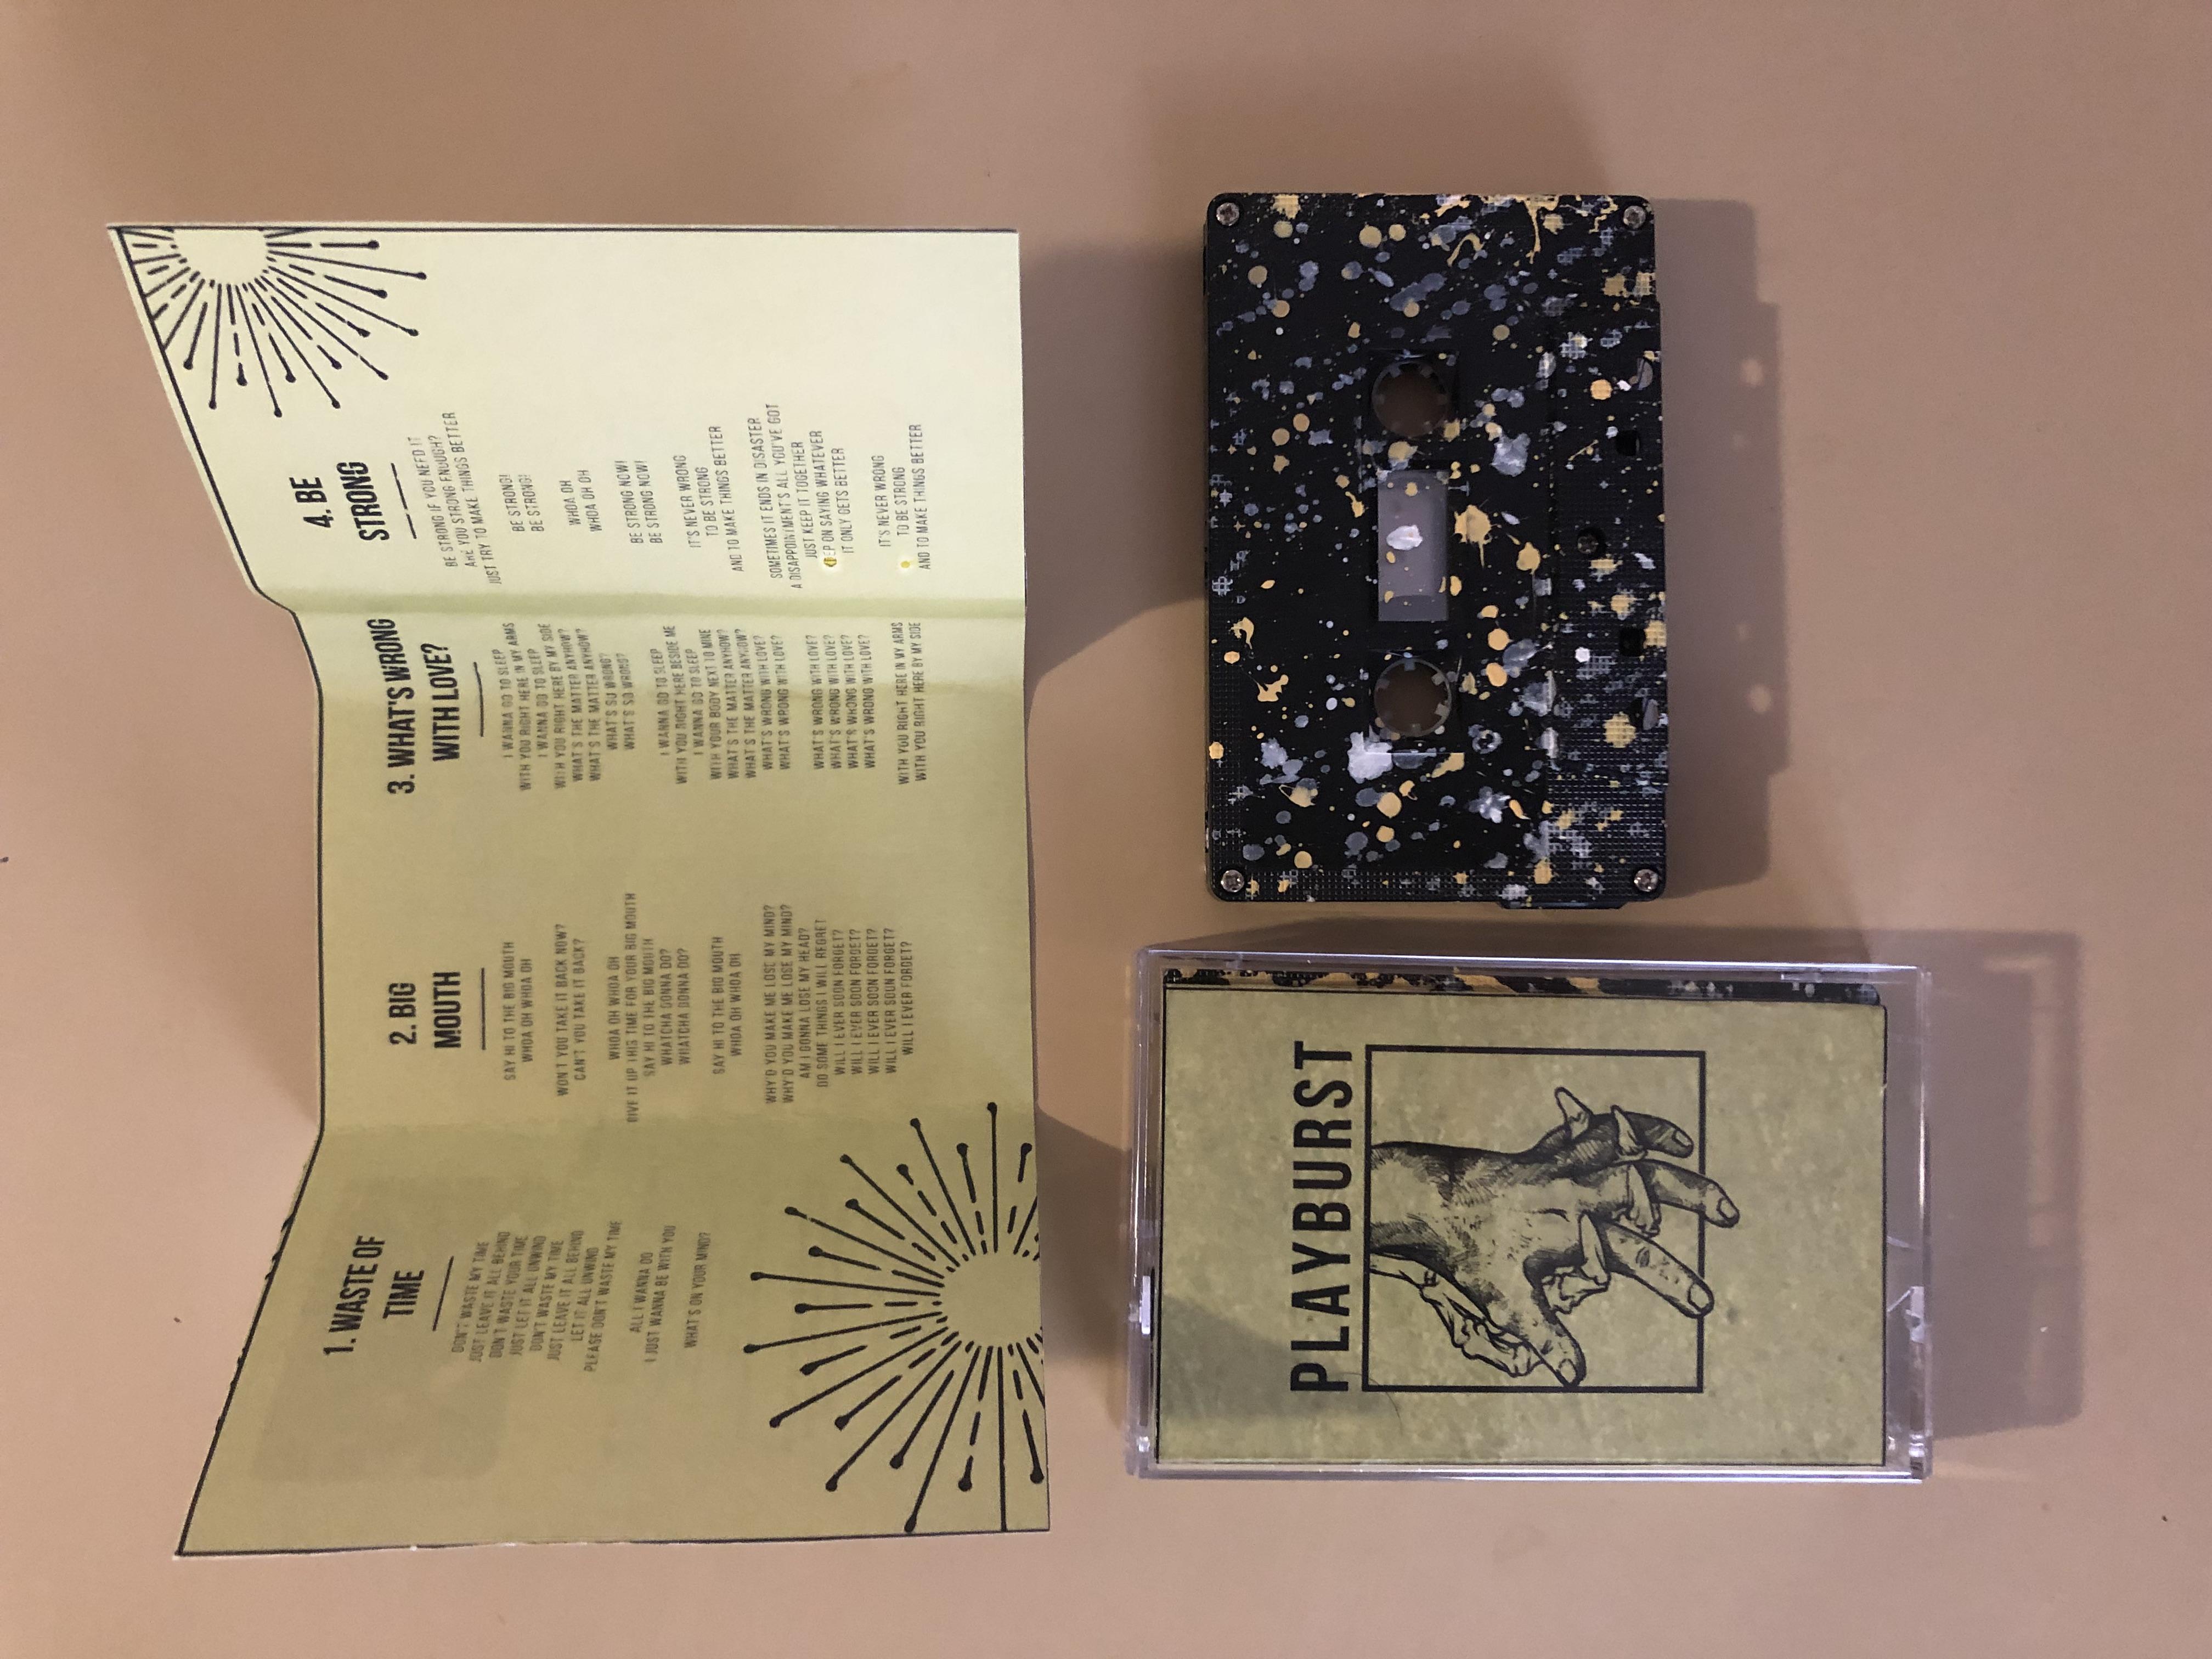 PLAYBURST - S/T - Tape